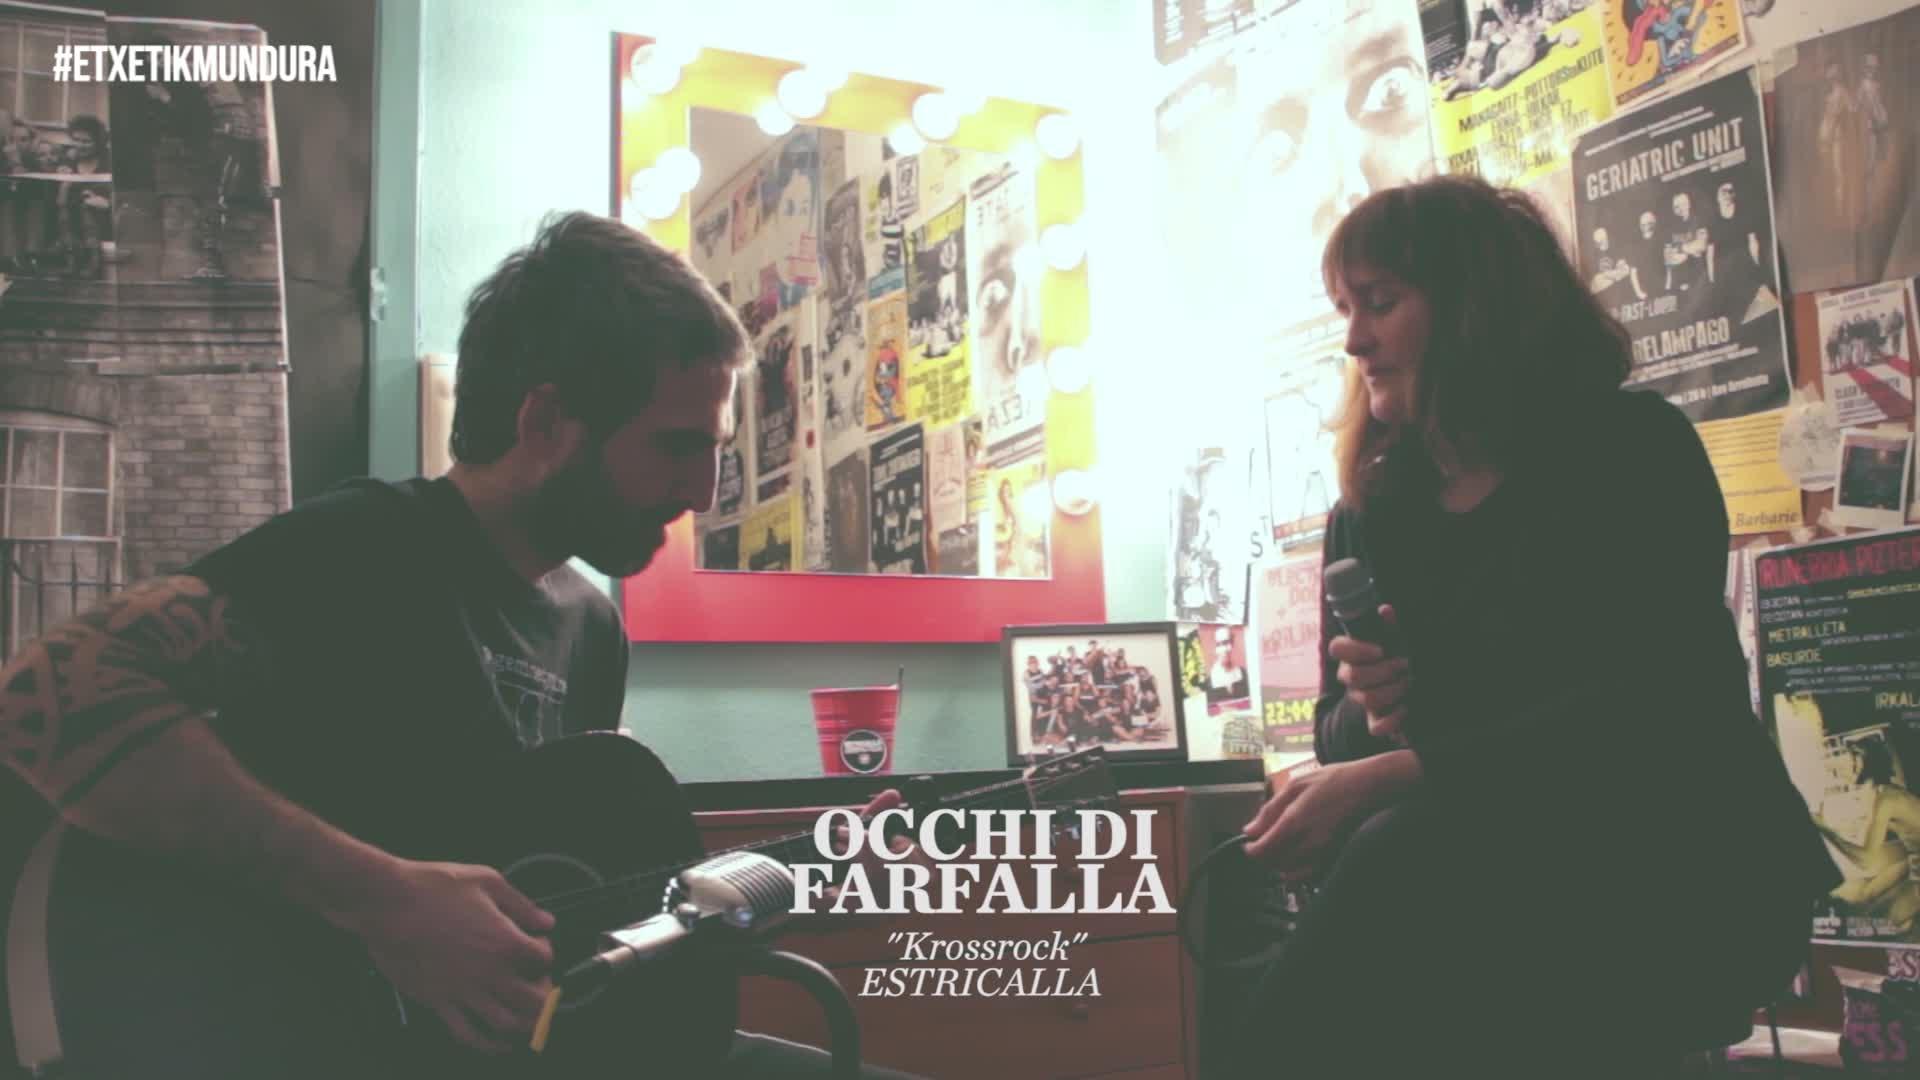 Occhi di Farfallaren musika, etxetik mundura